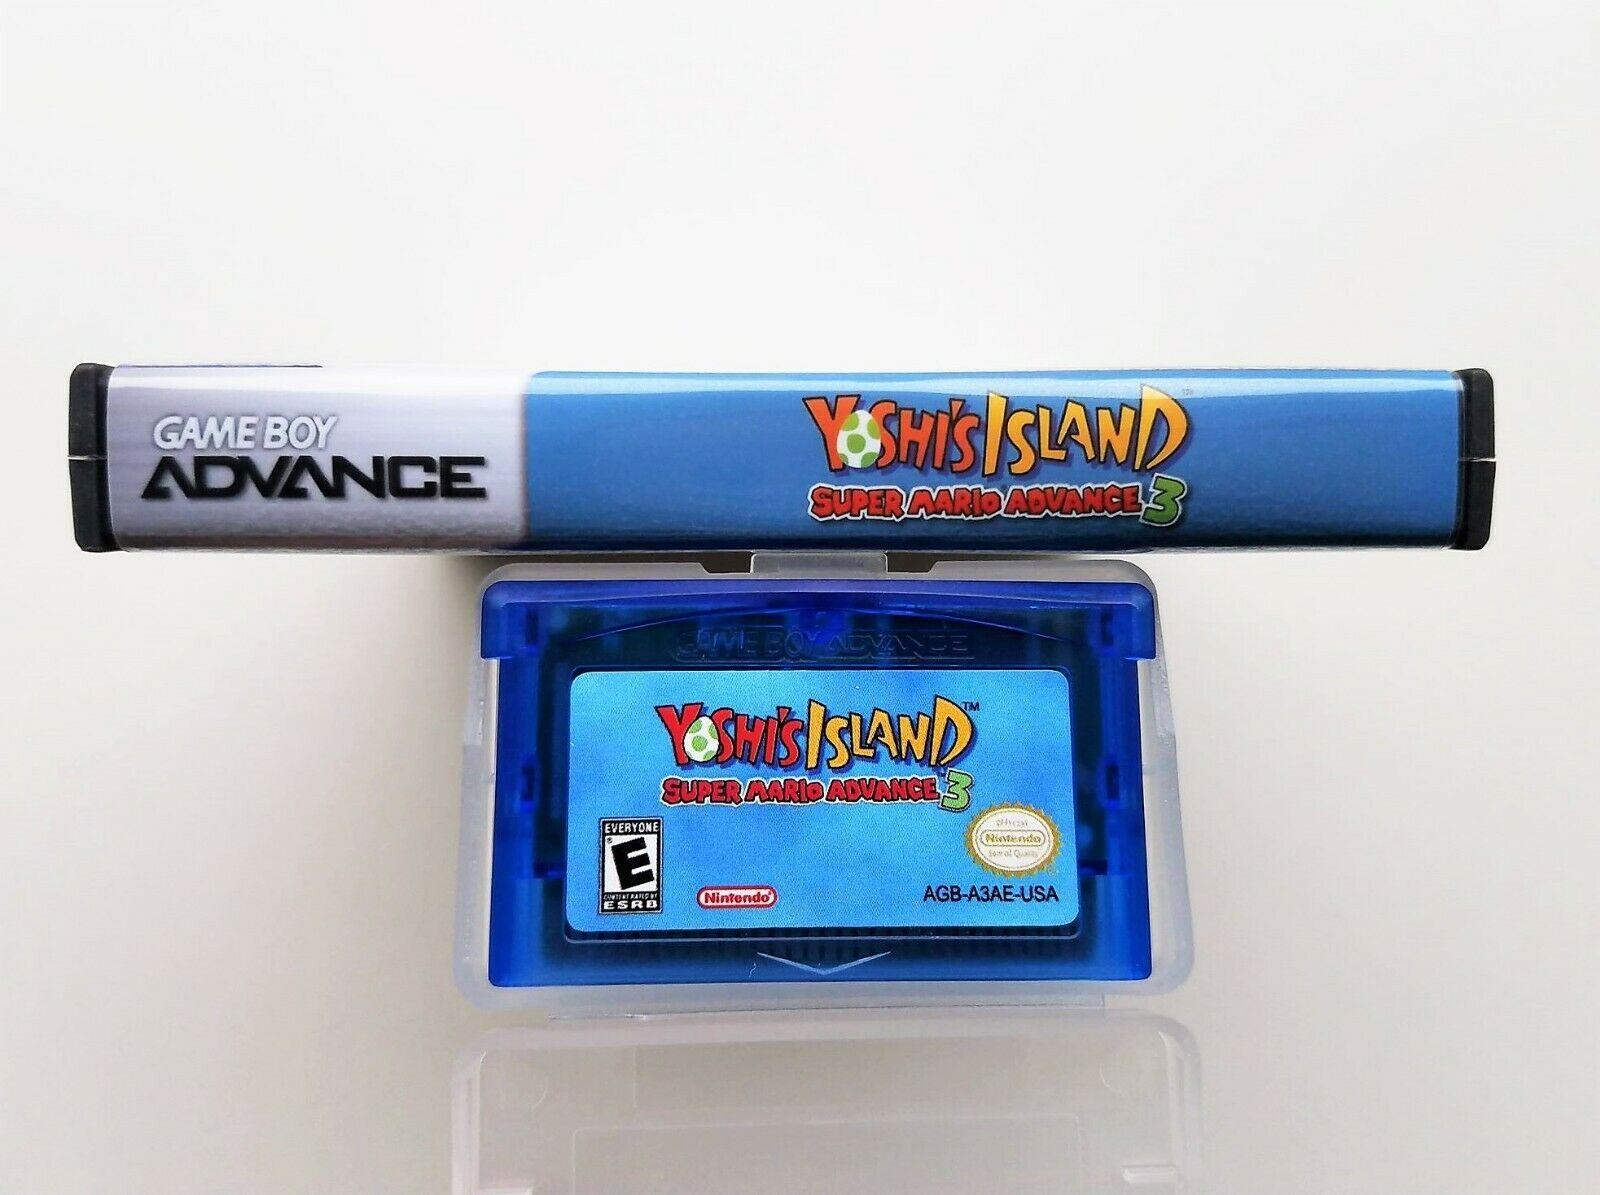 Yoshi's Island Super Mario World Advance 3 - Nintendo Game Boy Advance GBA (USA) image 5